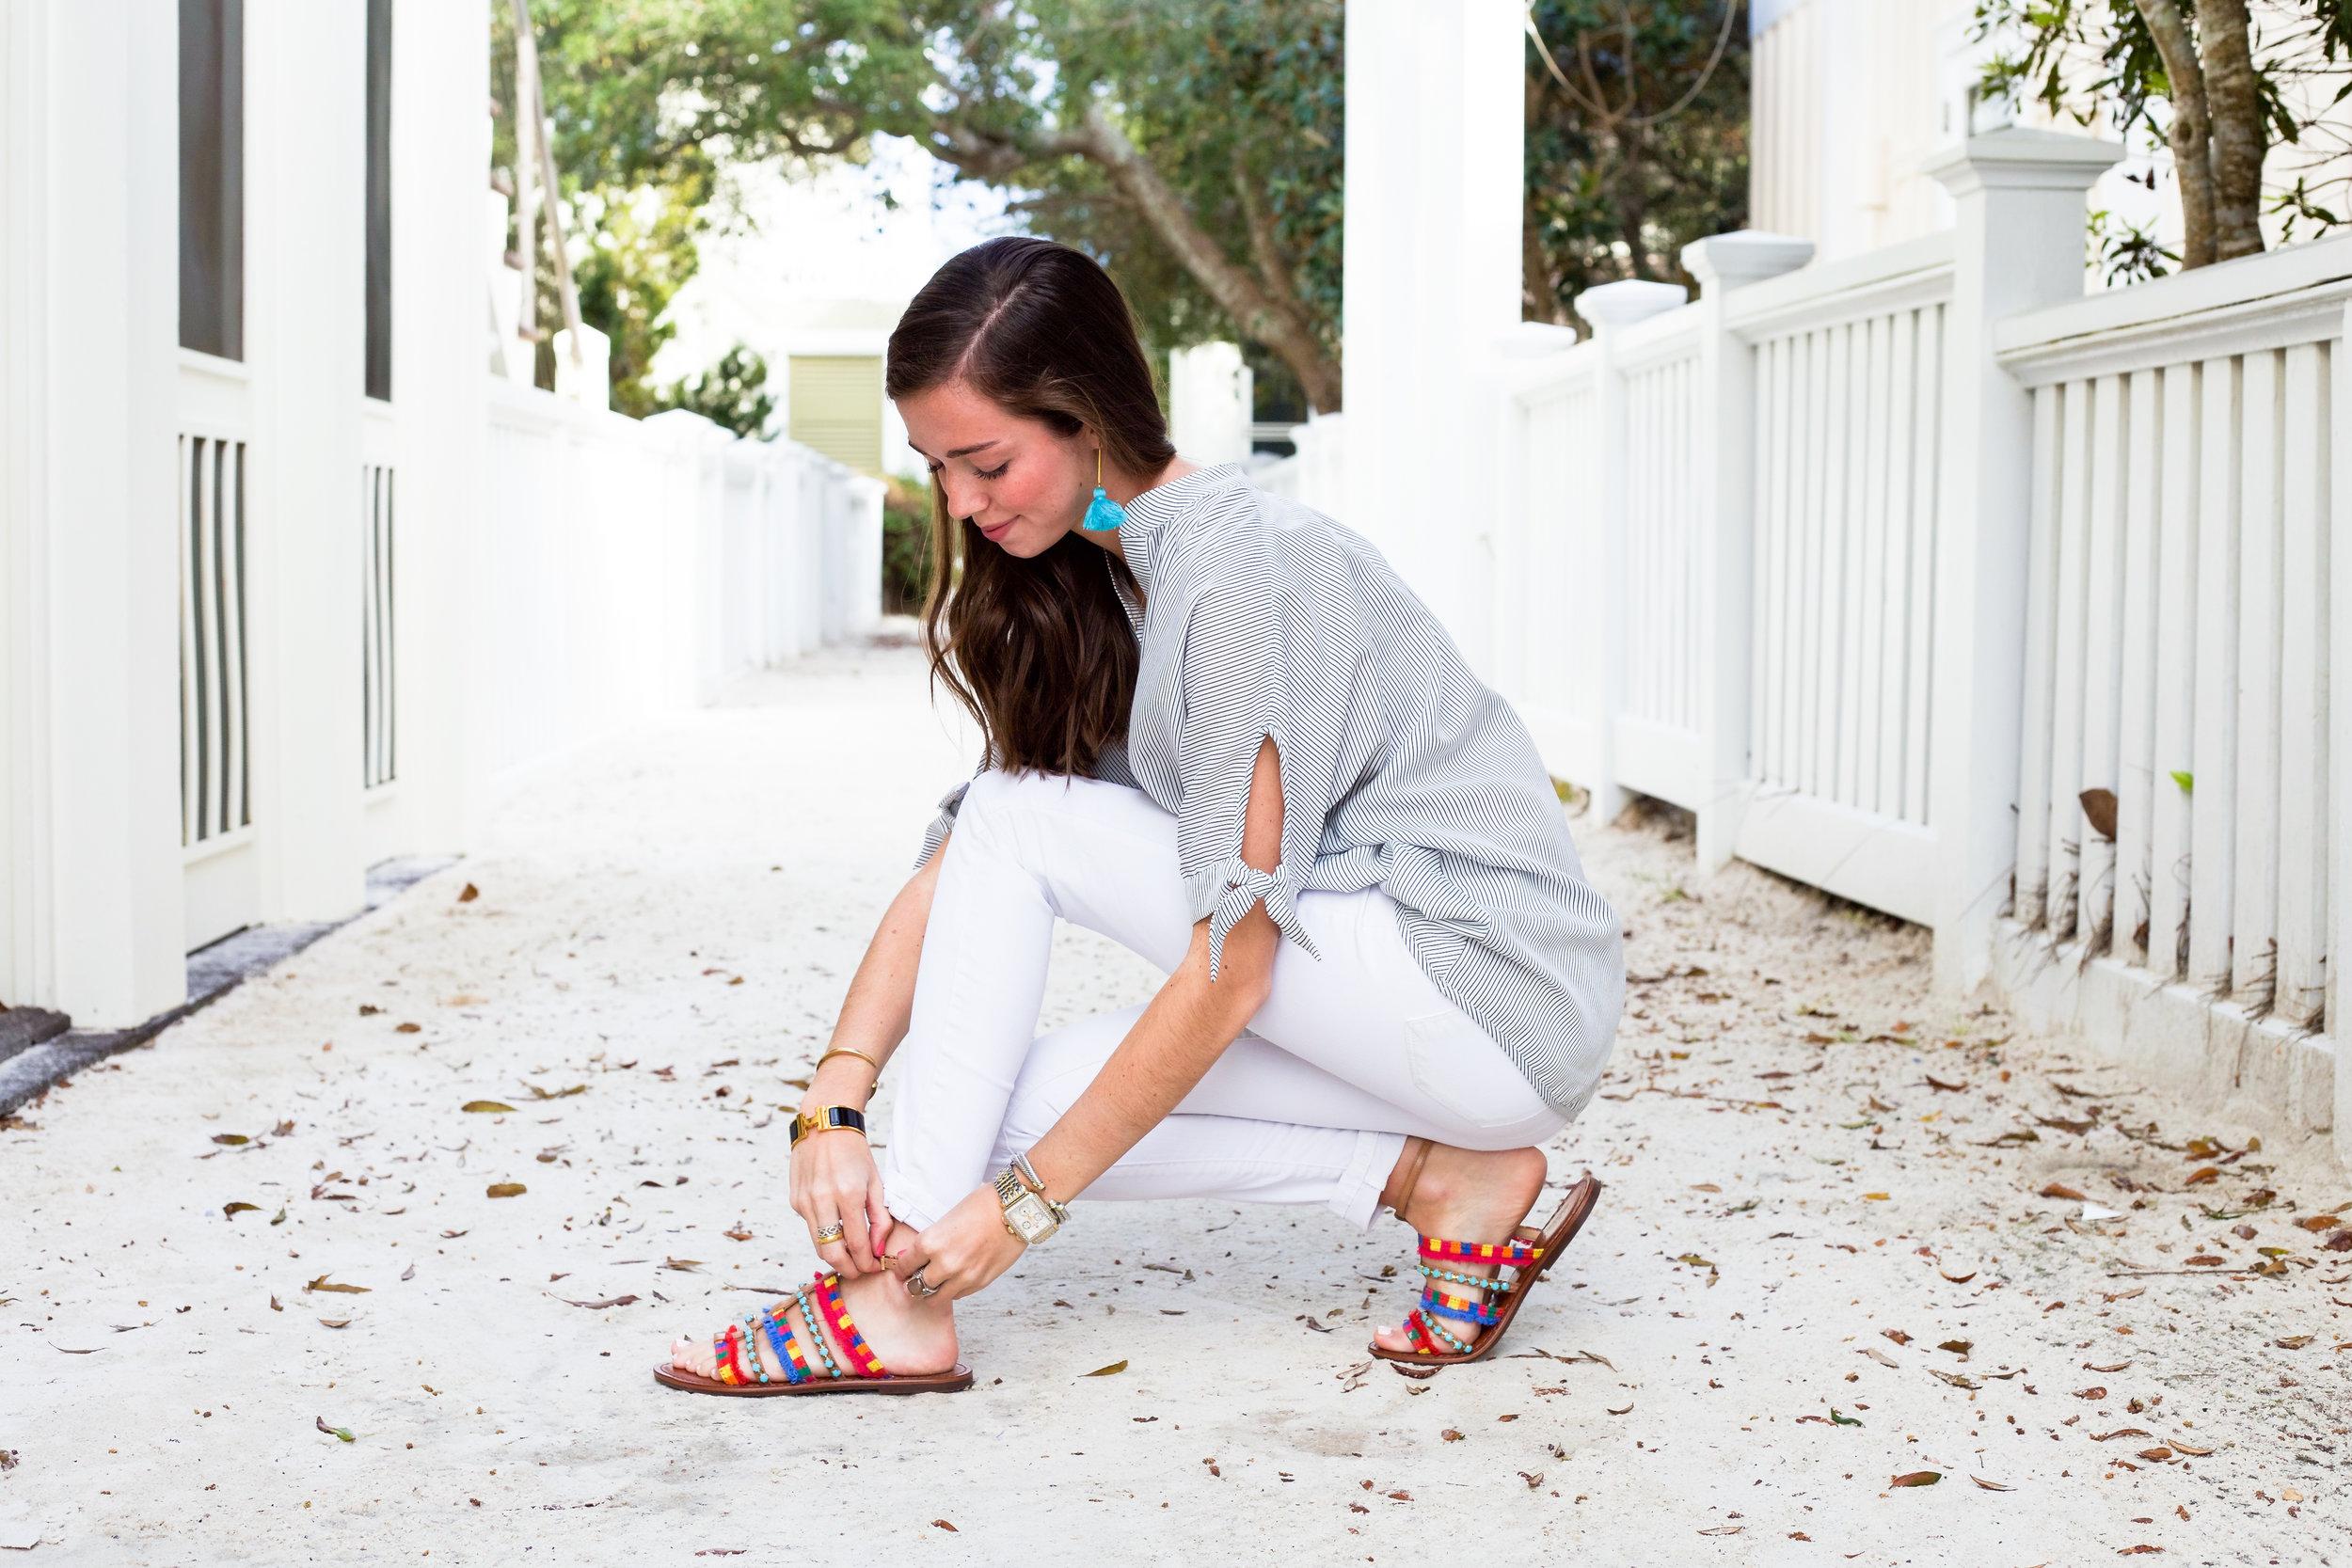 lcb style fashion blogger monkees seaside beach florida (8 of 15).jpg